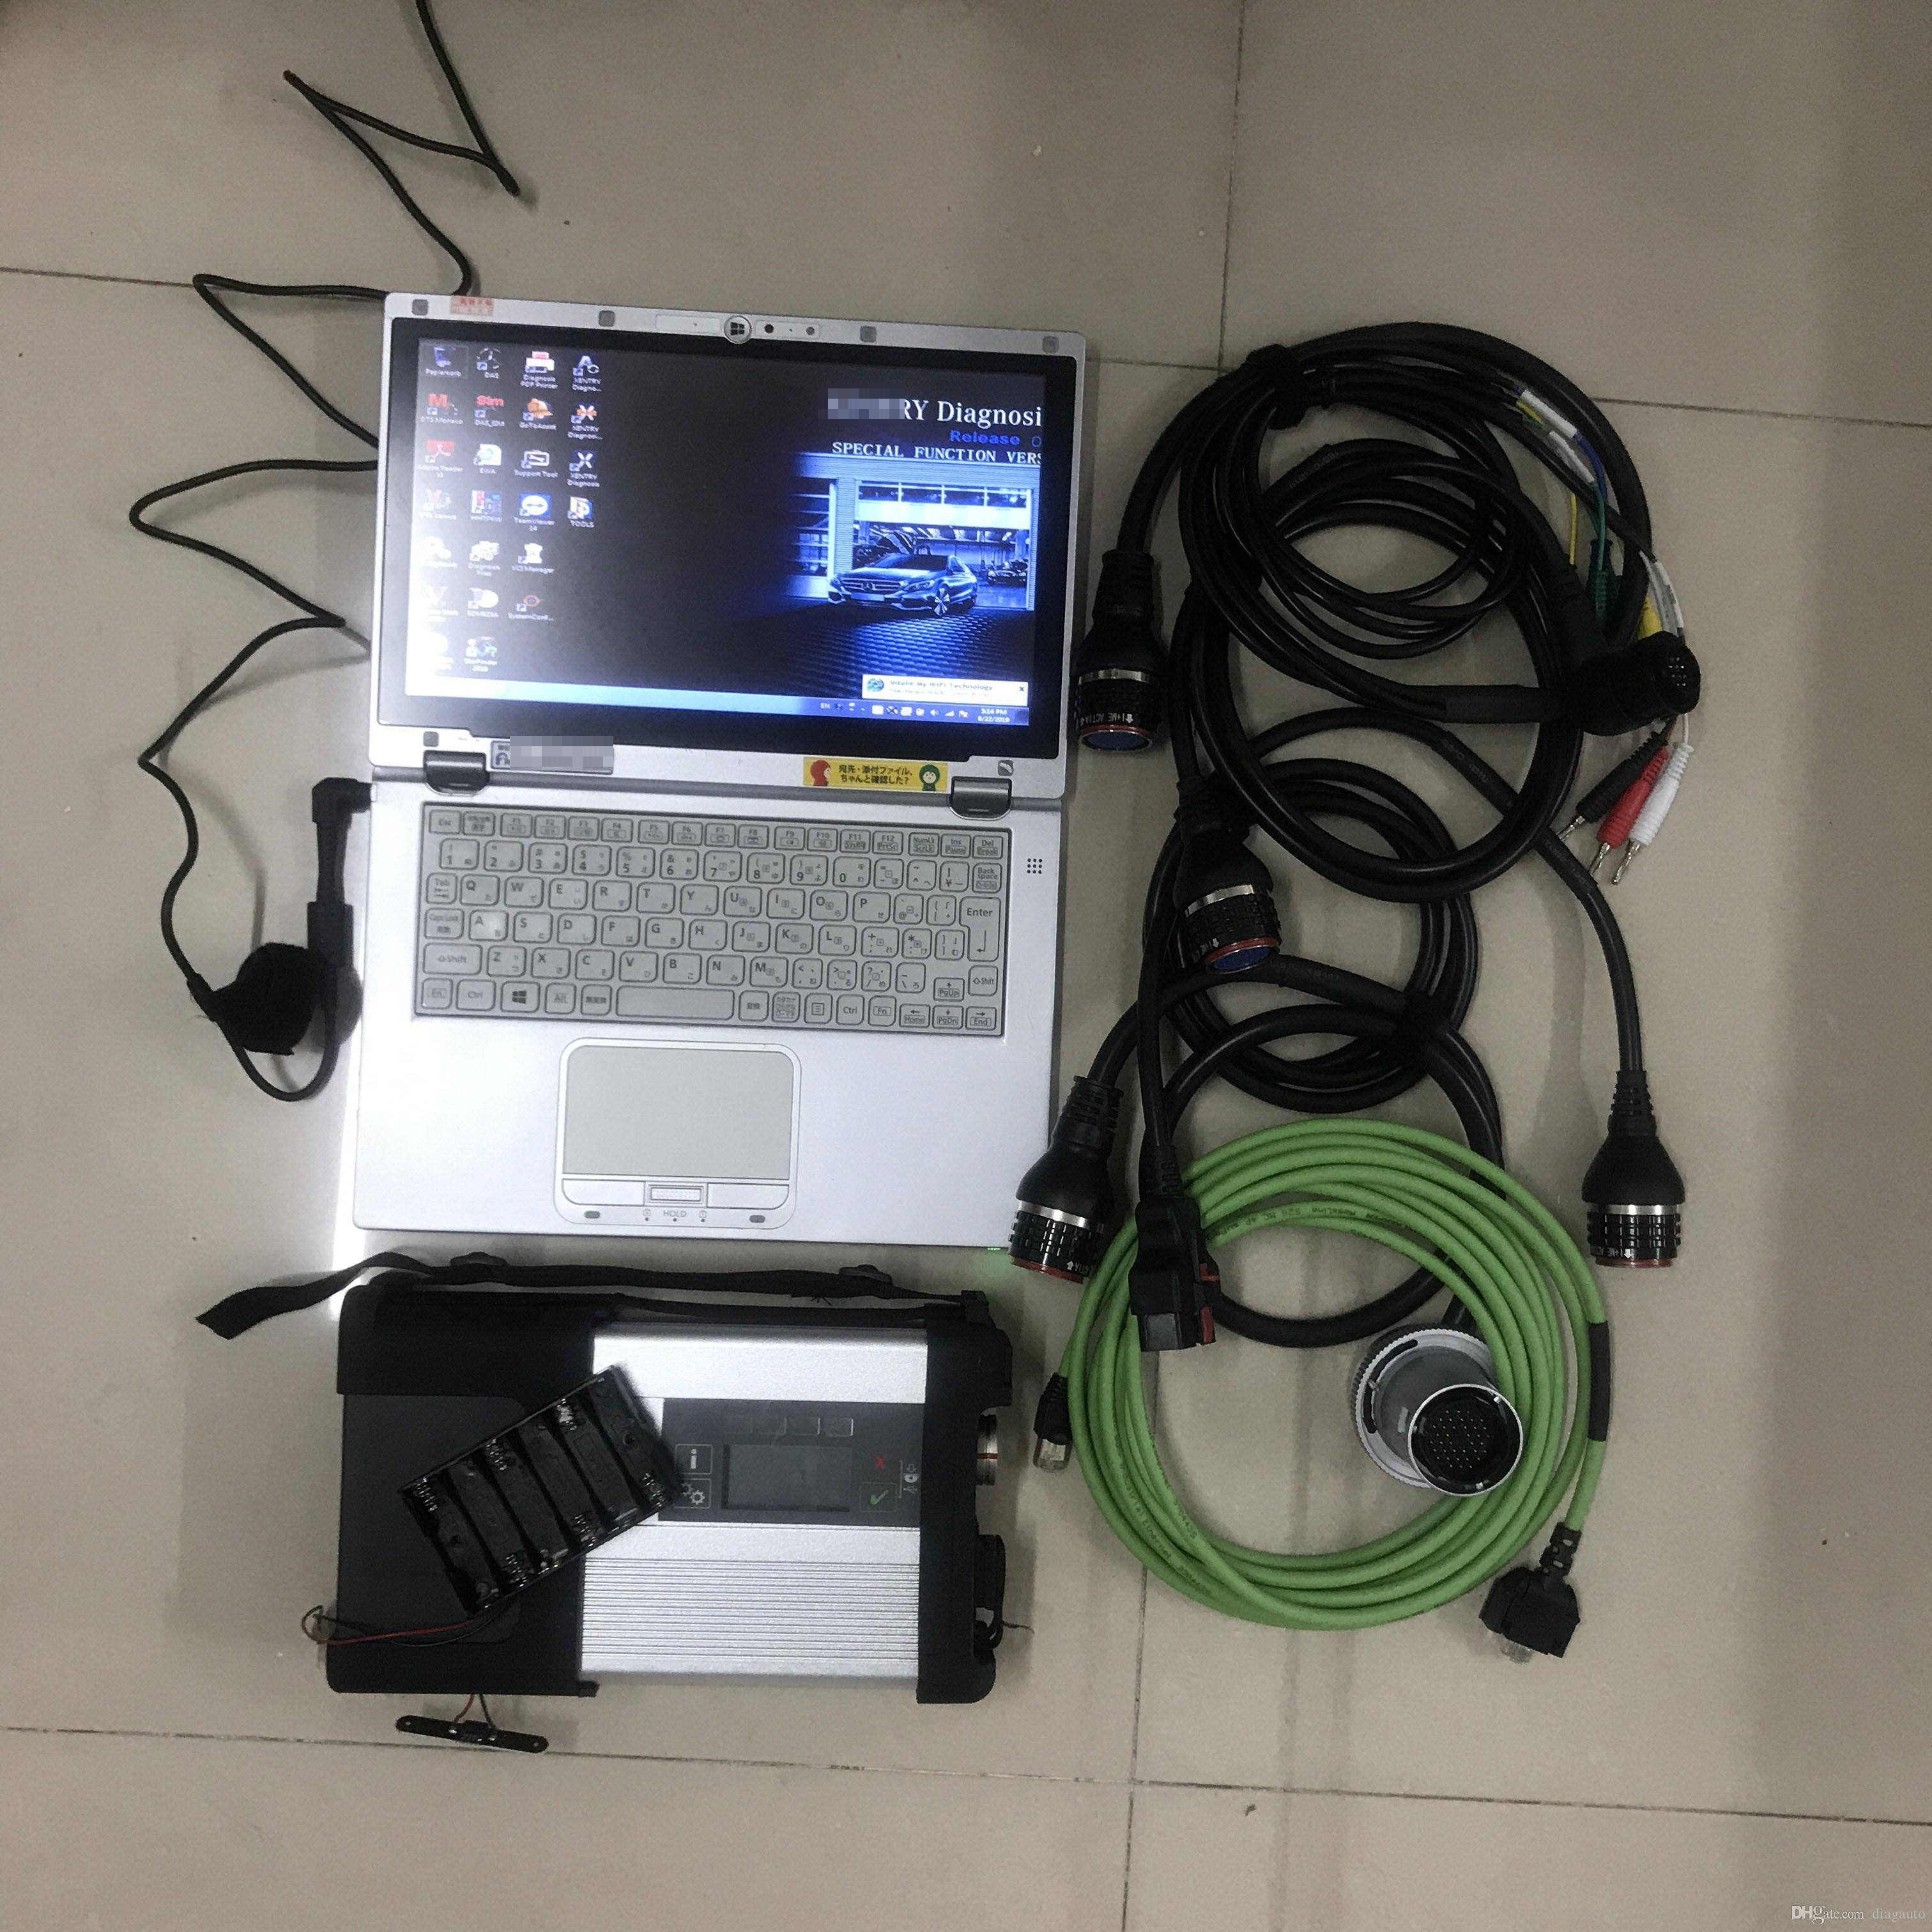 MB ستار C5 SD مضاعف C5 مع CF-AX2 480GB SSD 2021.03V X / Vediamo / DAS / DTS / EPC / HHT للأداة التشخيصية السيارات Mercdes Star C5